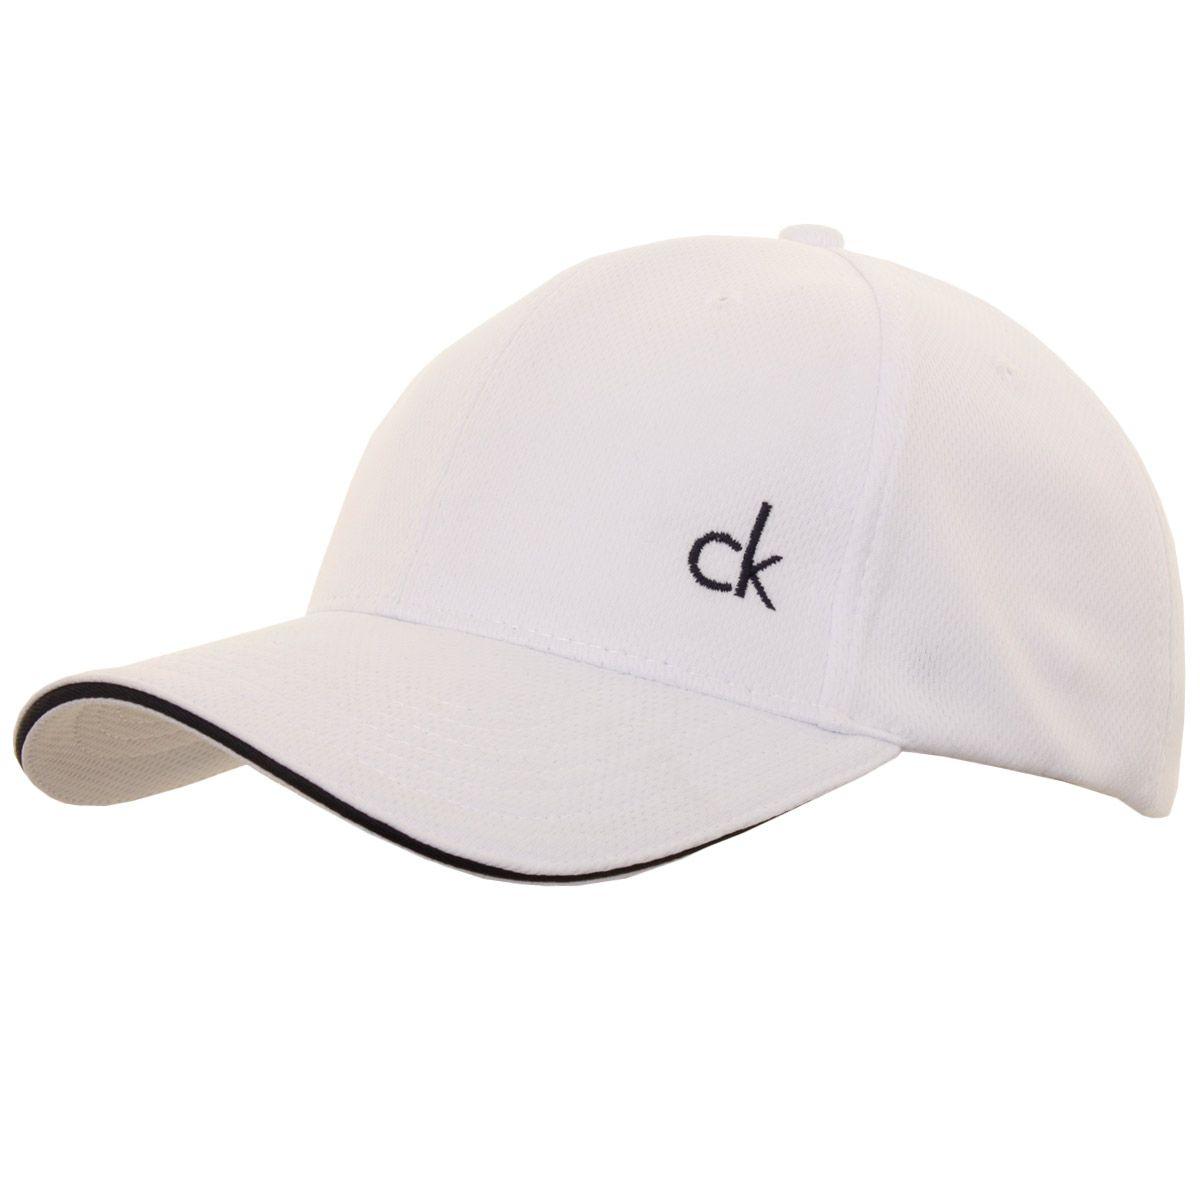 4e65a7d1447 Calvin Klein Golf 2016 Mens CK Airtex Adjustable Mesh Cap Baseball Hat